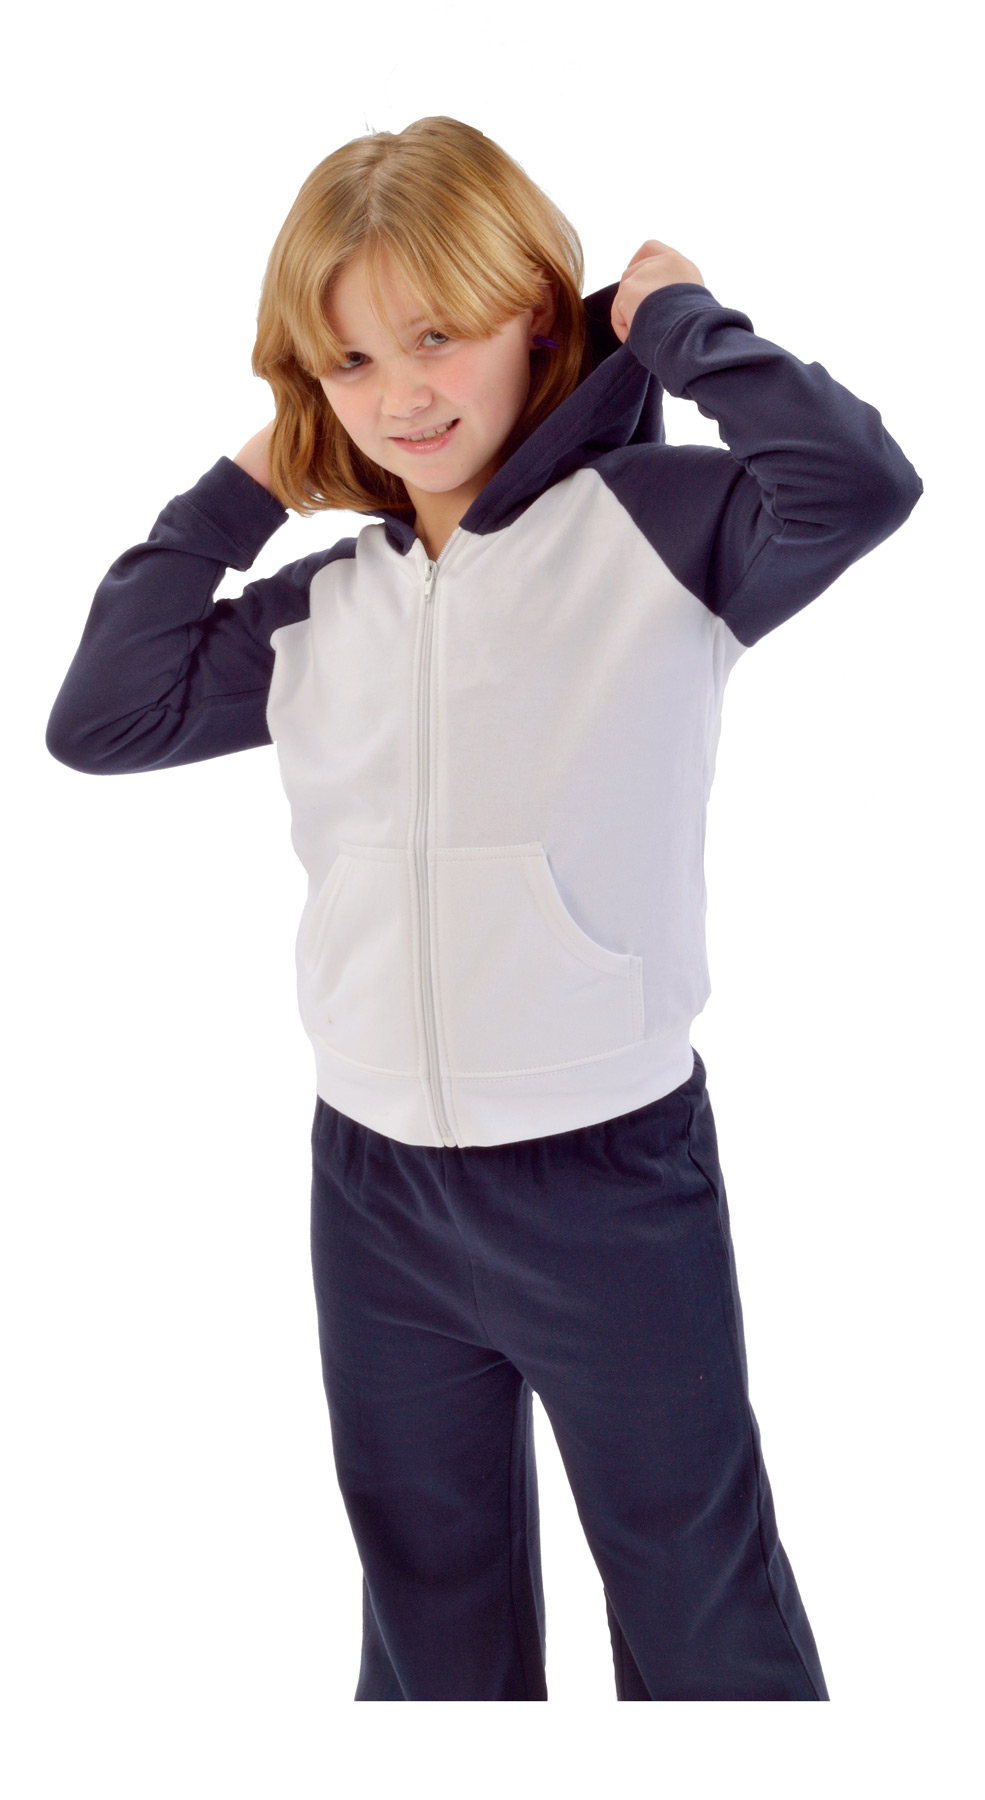 Monag 600004 - Fleece Hooded Raglan Jacket